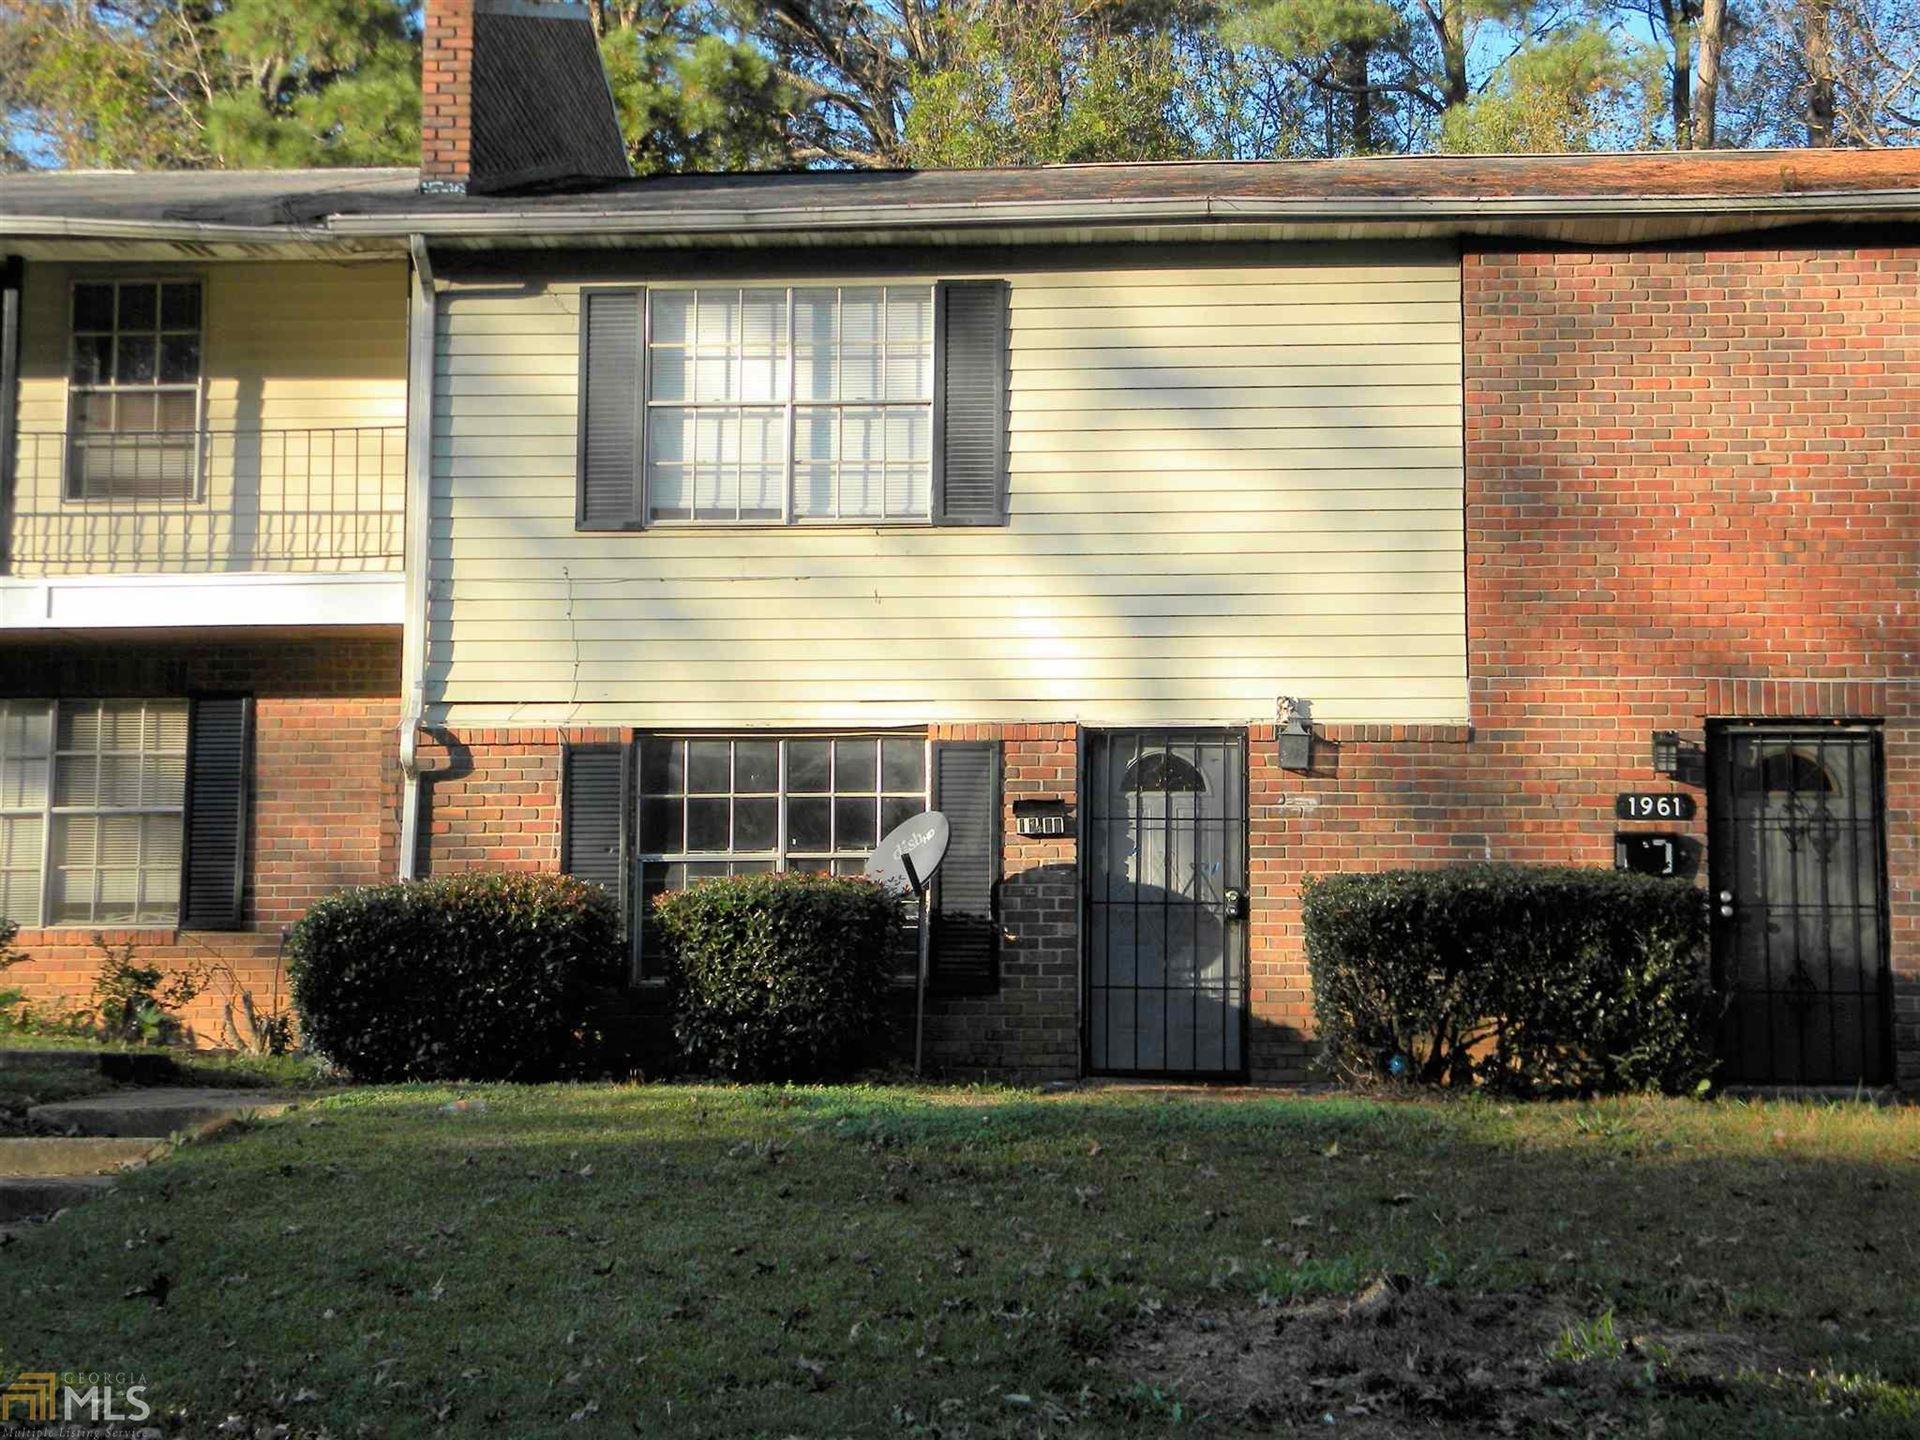 1959 Whitehall Forest Ct, Atlanta, GA 30316 - MLS#: 8896419